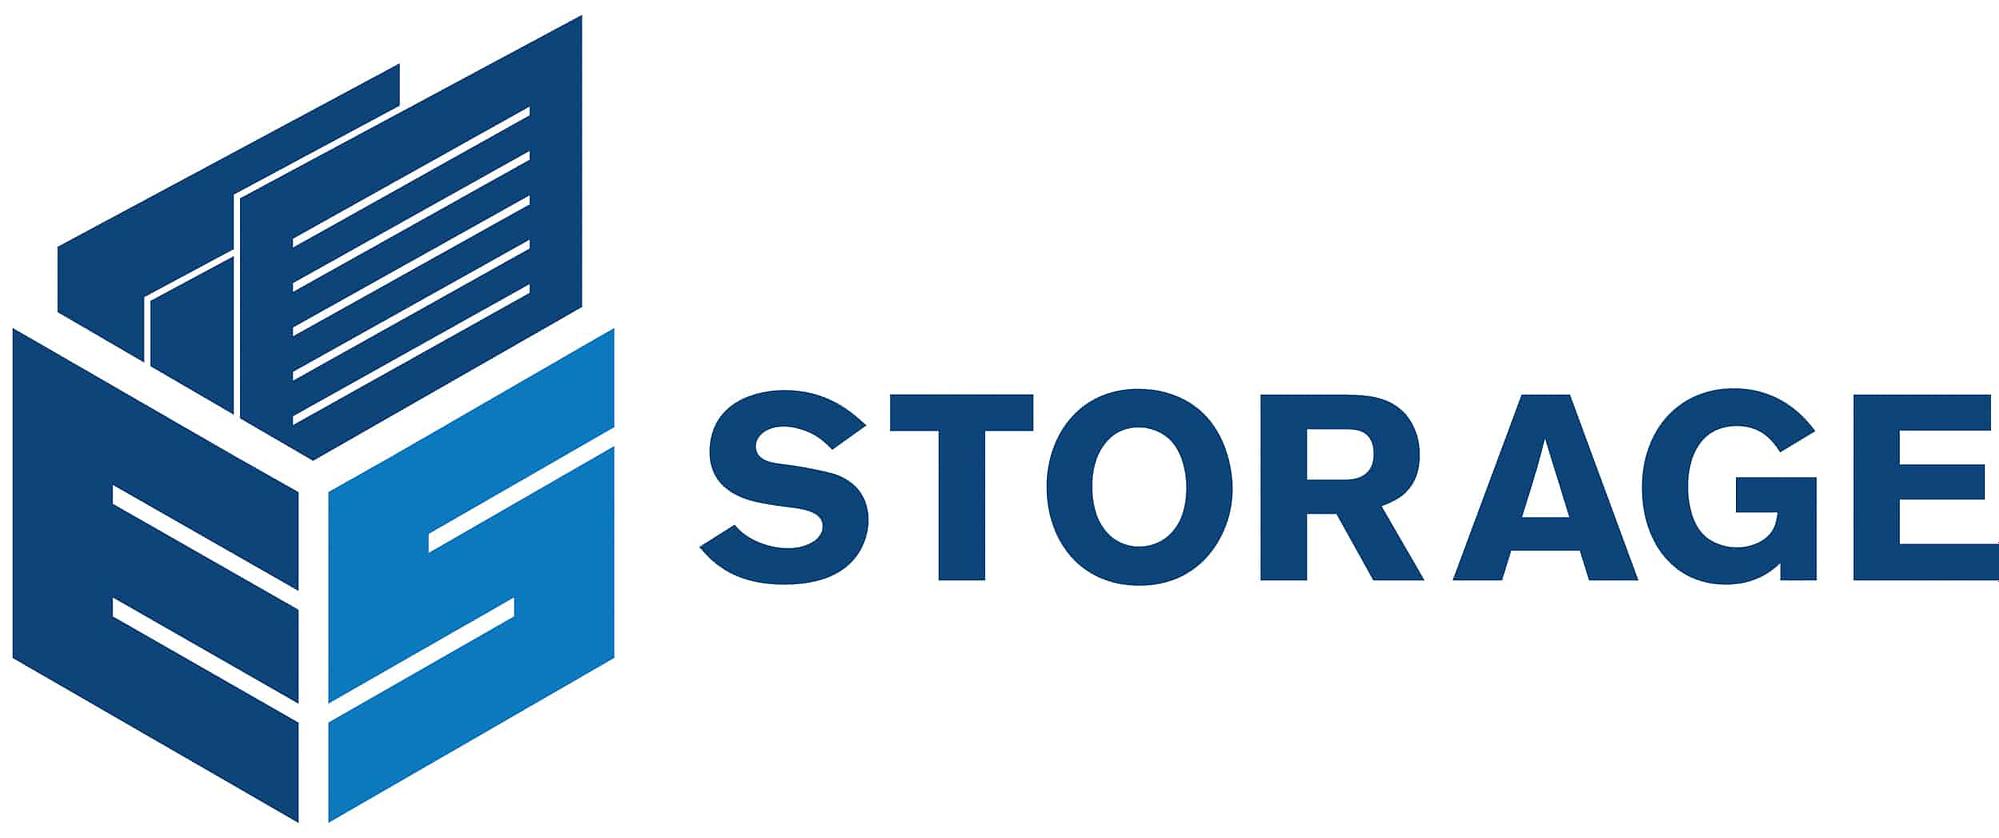 Storage Logo, no EvaStore